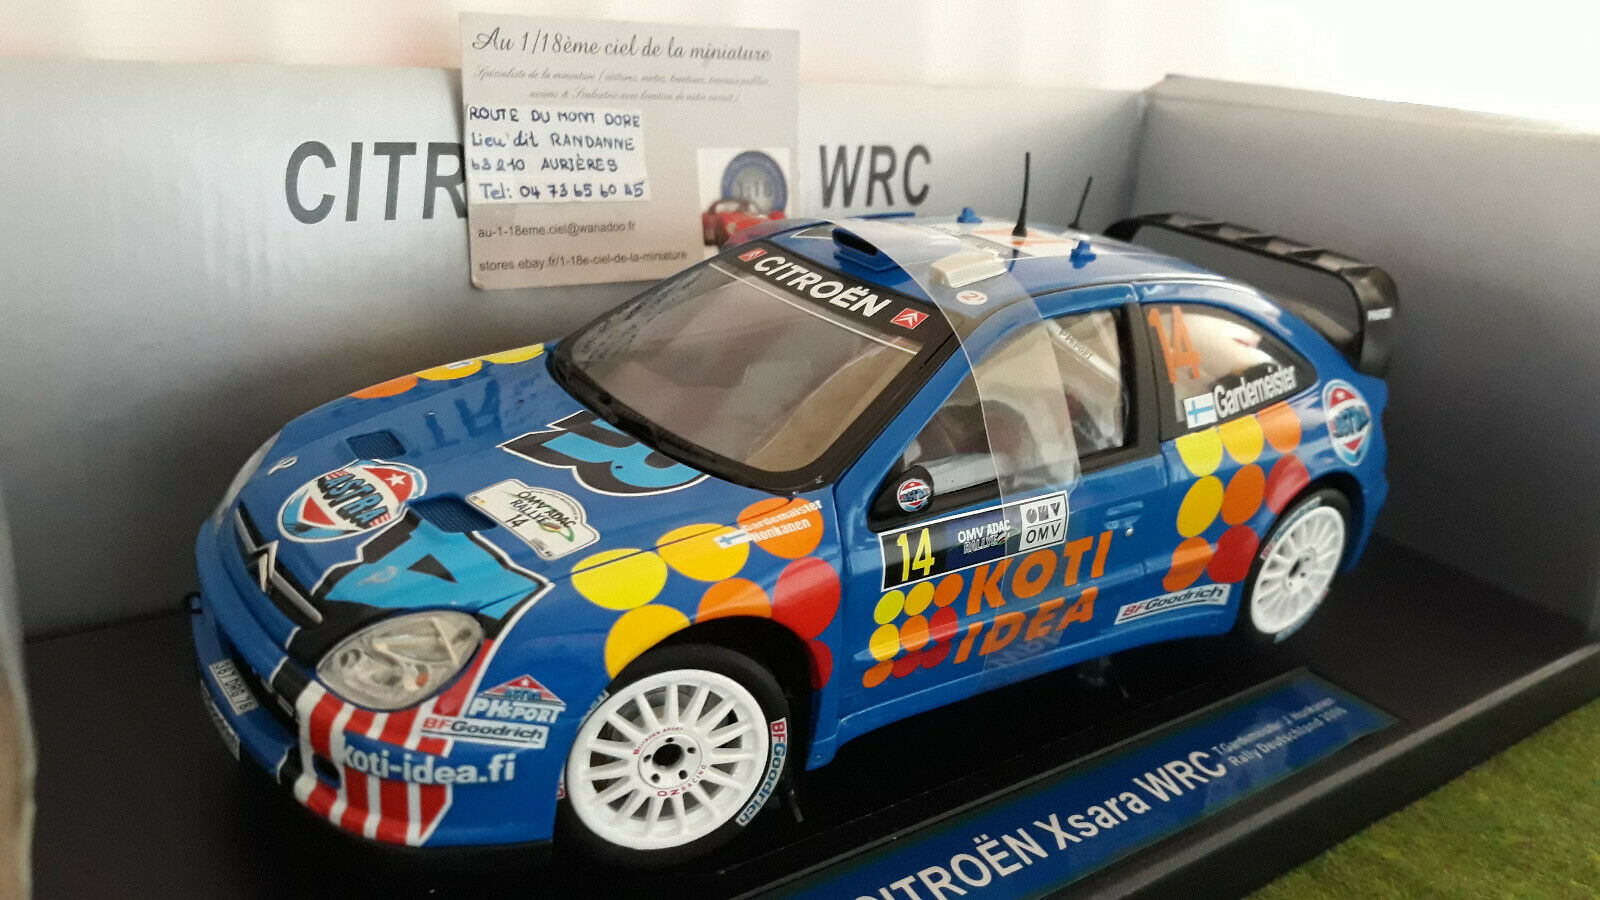 respuestas rápidas CITROËN XSARA WRC 2006 2006 2006 G RALLYE DEUTSCHLAND 1 18 SUN Estrella 4428 voiture miniature  solo para ti